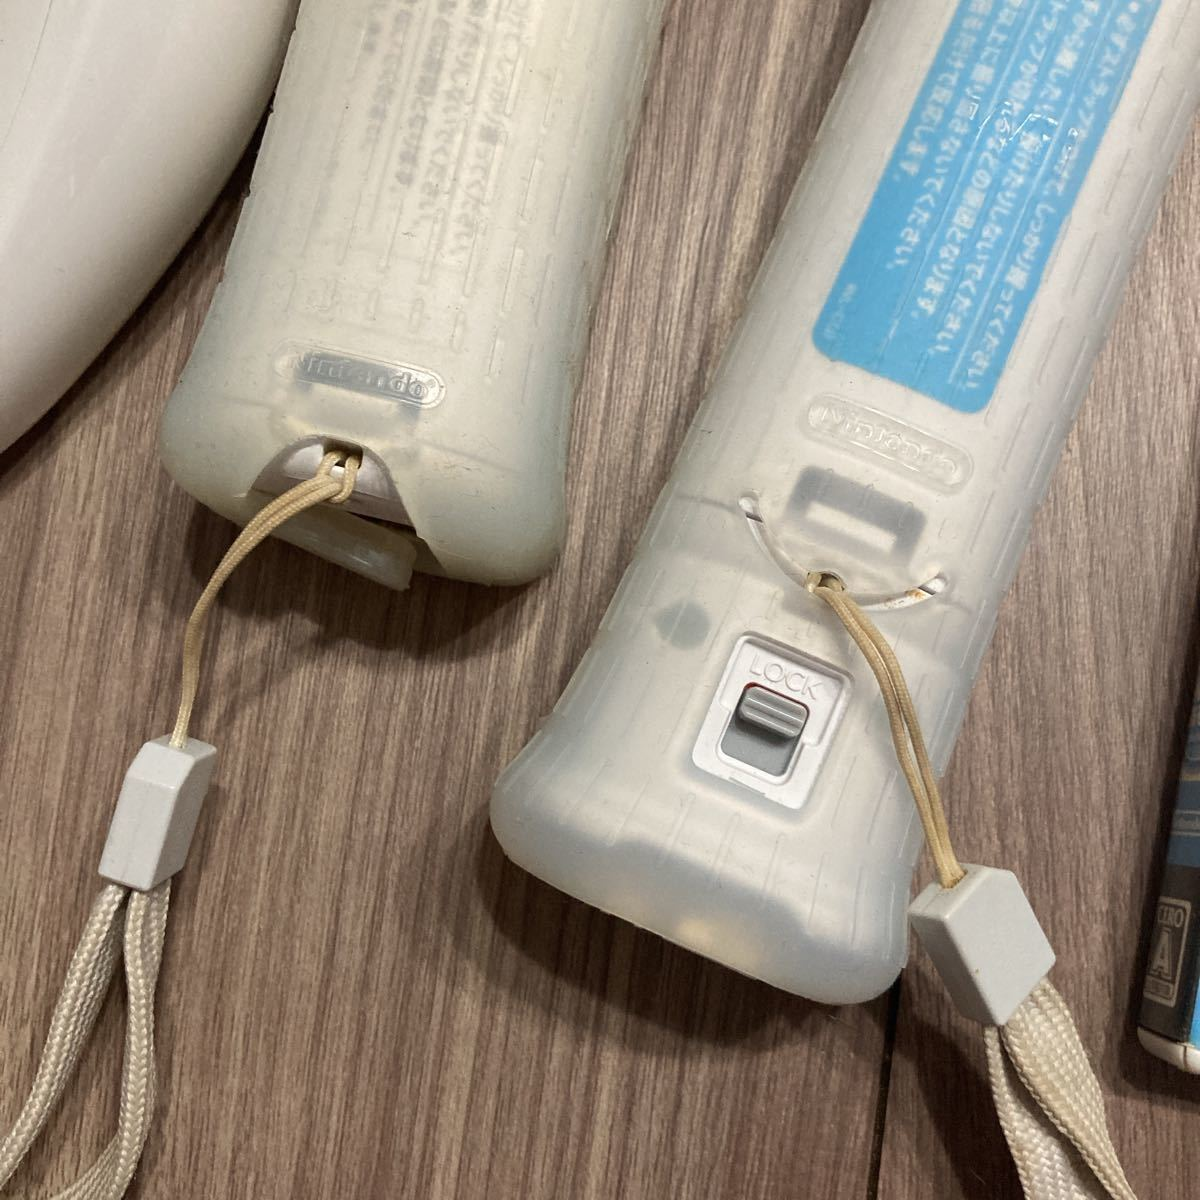 Nintendo Wii リモコン ソフト セット モーションプラス ヌンチャク ドンキーコング ソフトカバー付属